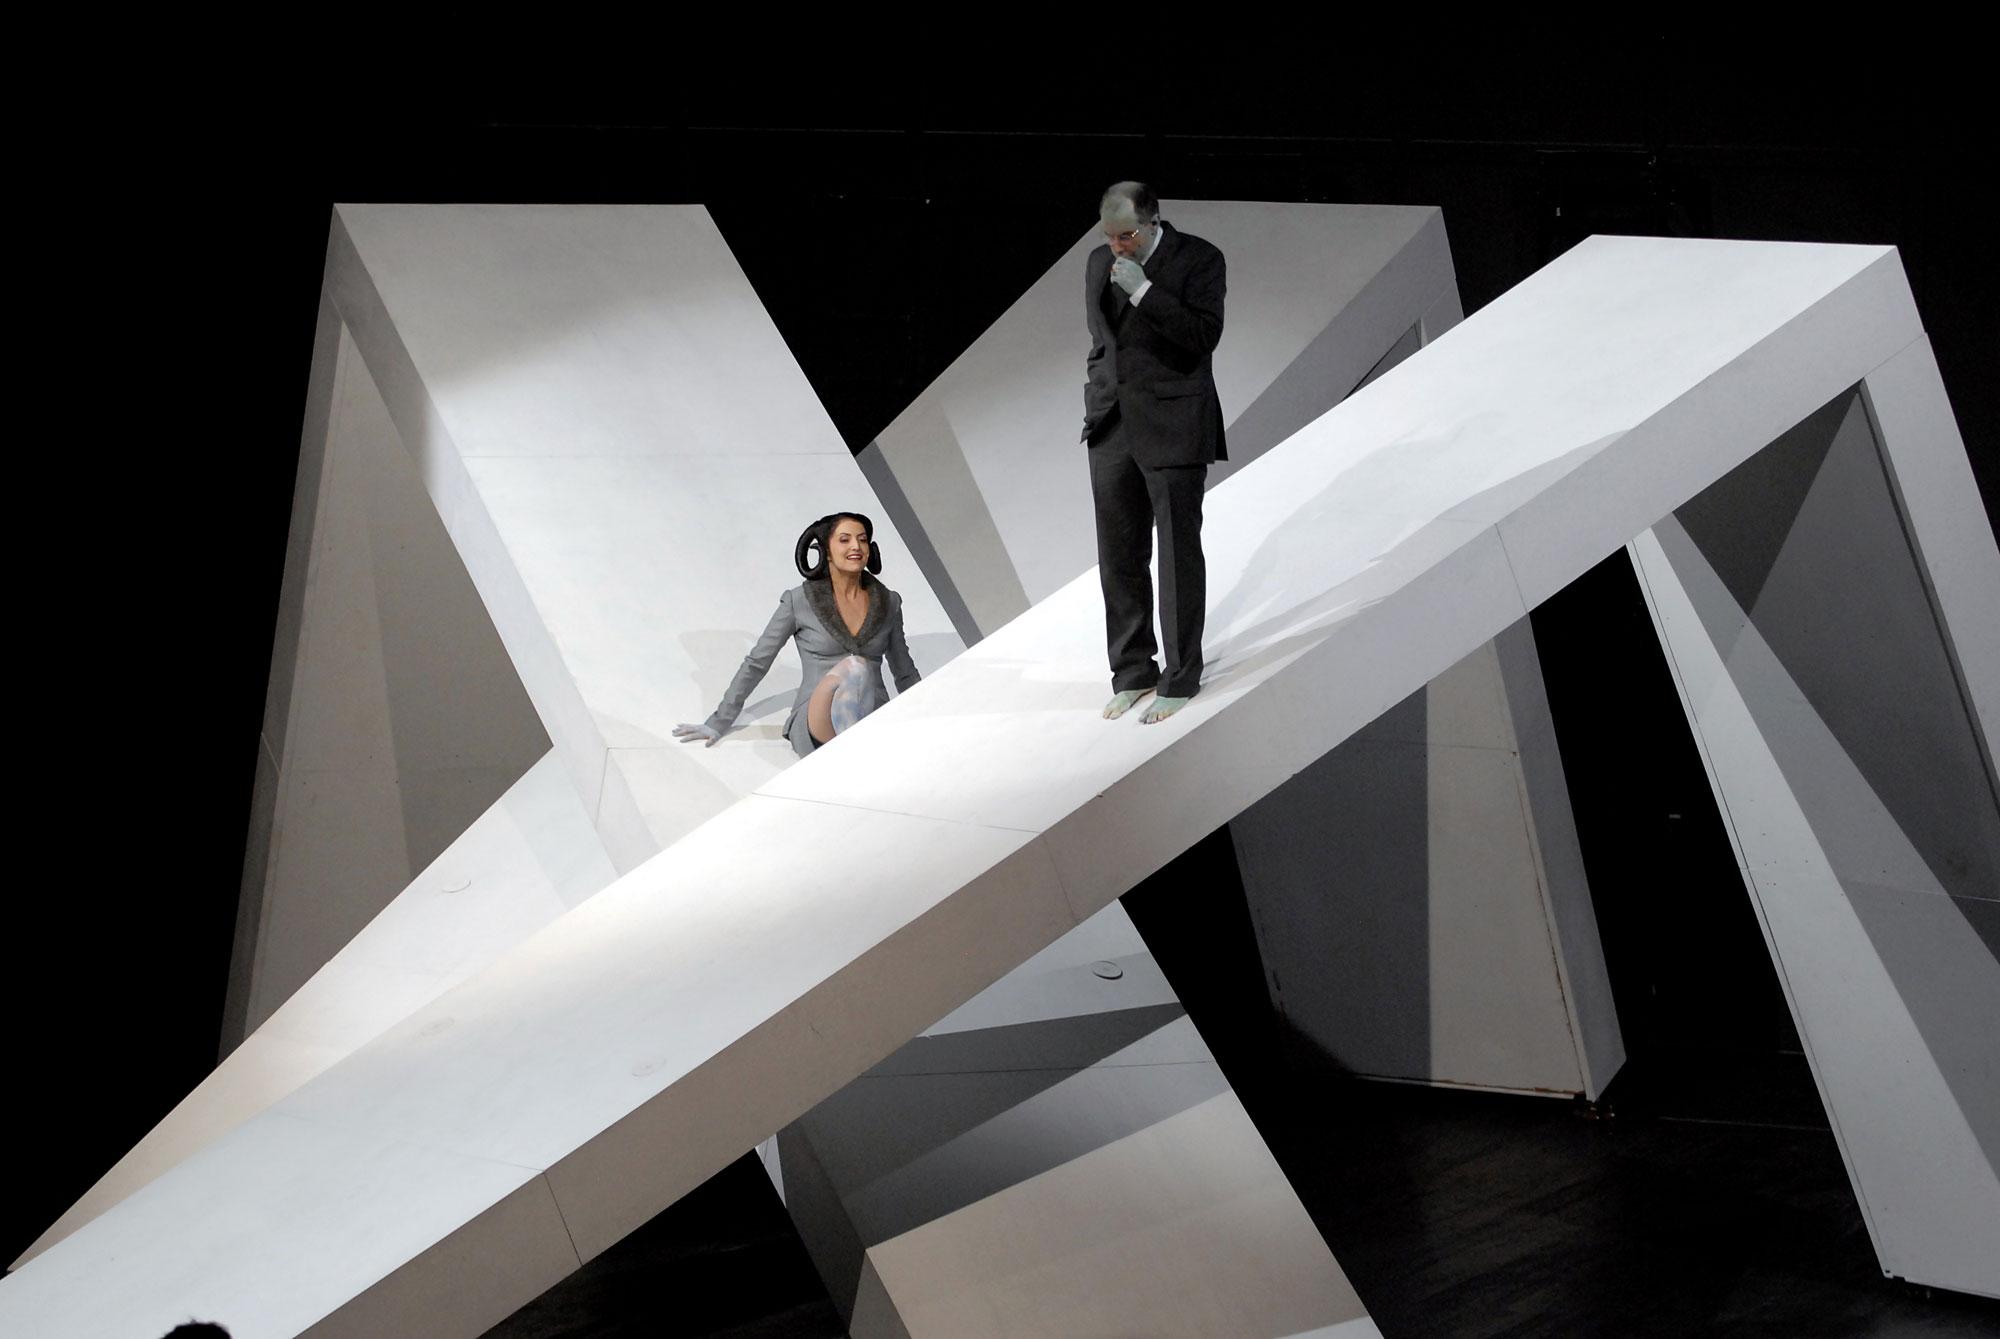 Medea. Stimmen, Christa Wolf, PAN.OPTIKUM, Theater Freiburg, Landesstiftung Baden-Württemberg, Christoph Kopp, Ingrid El Sigai